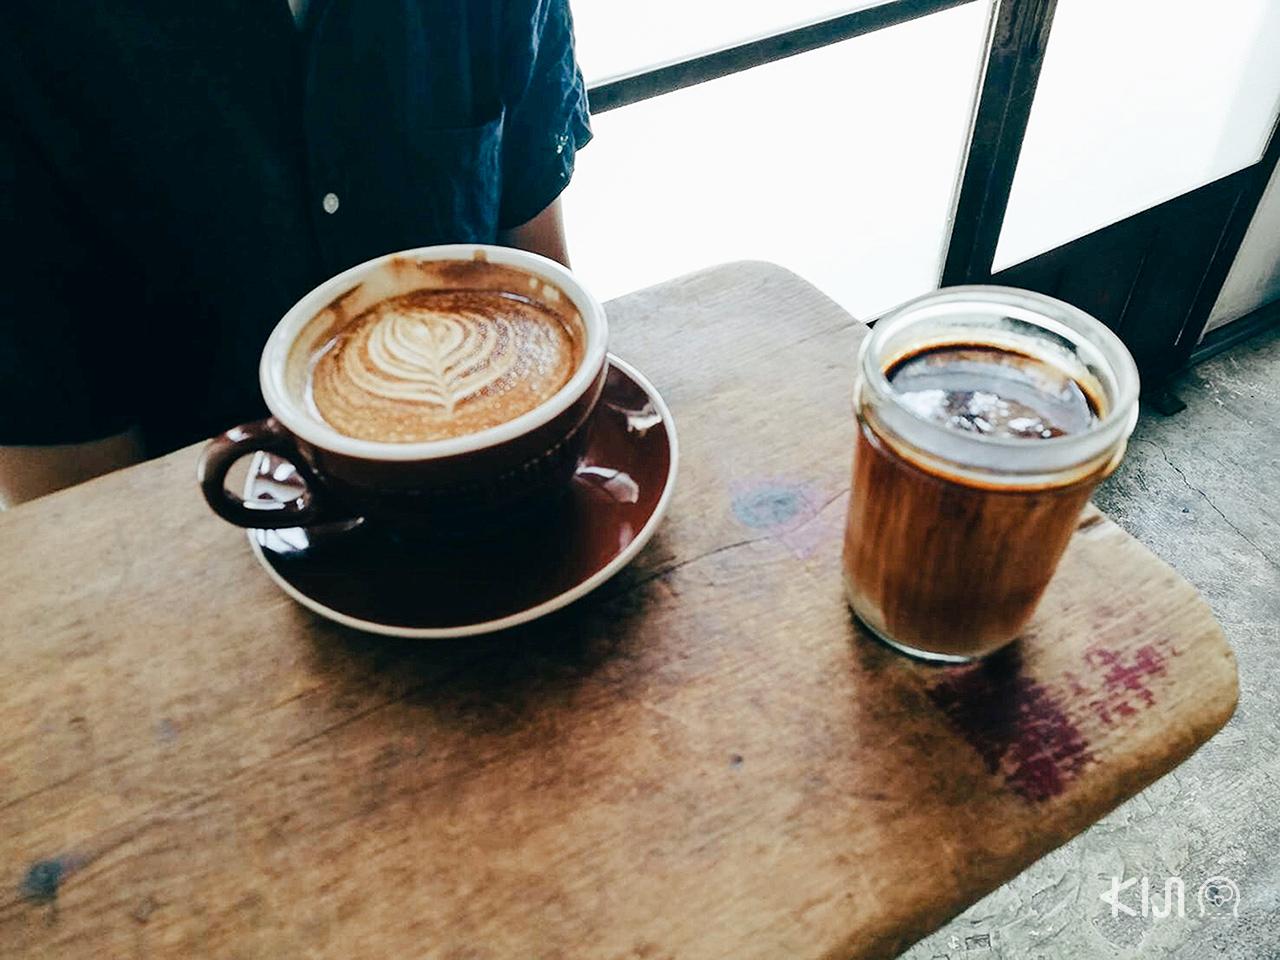 """Dirty"" กาแฟรสเข้มของร้าน Bear Pond Espresso"